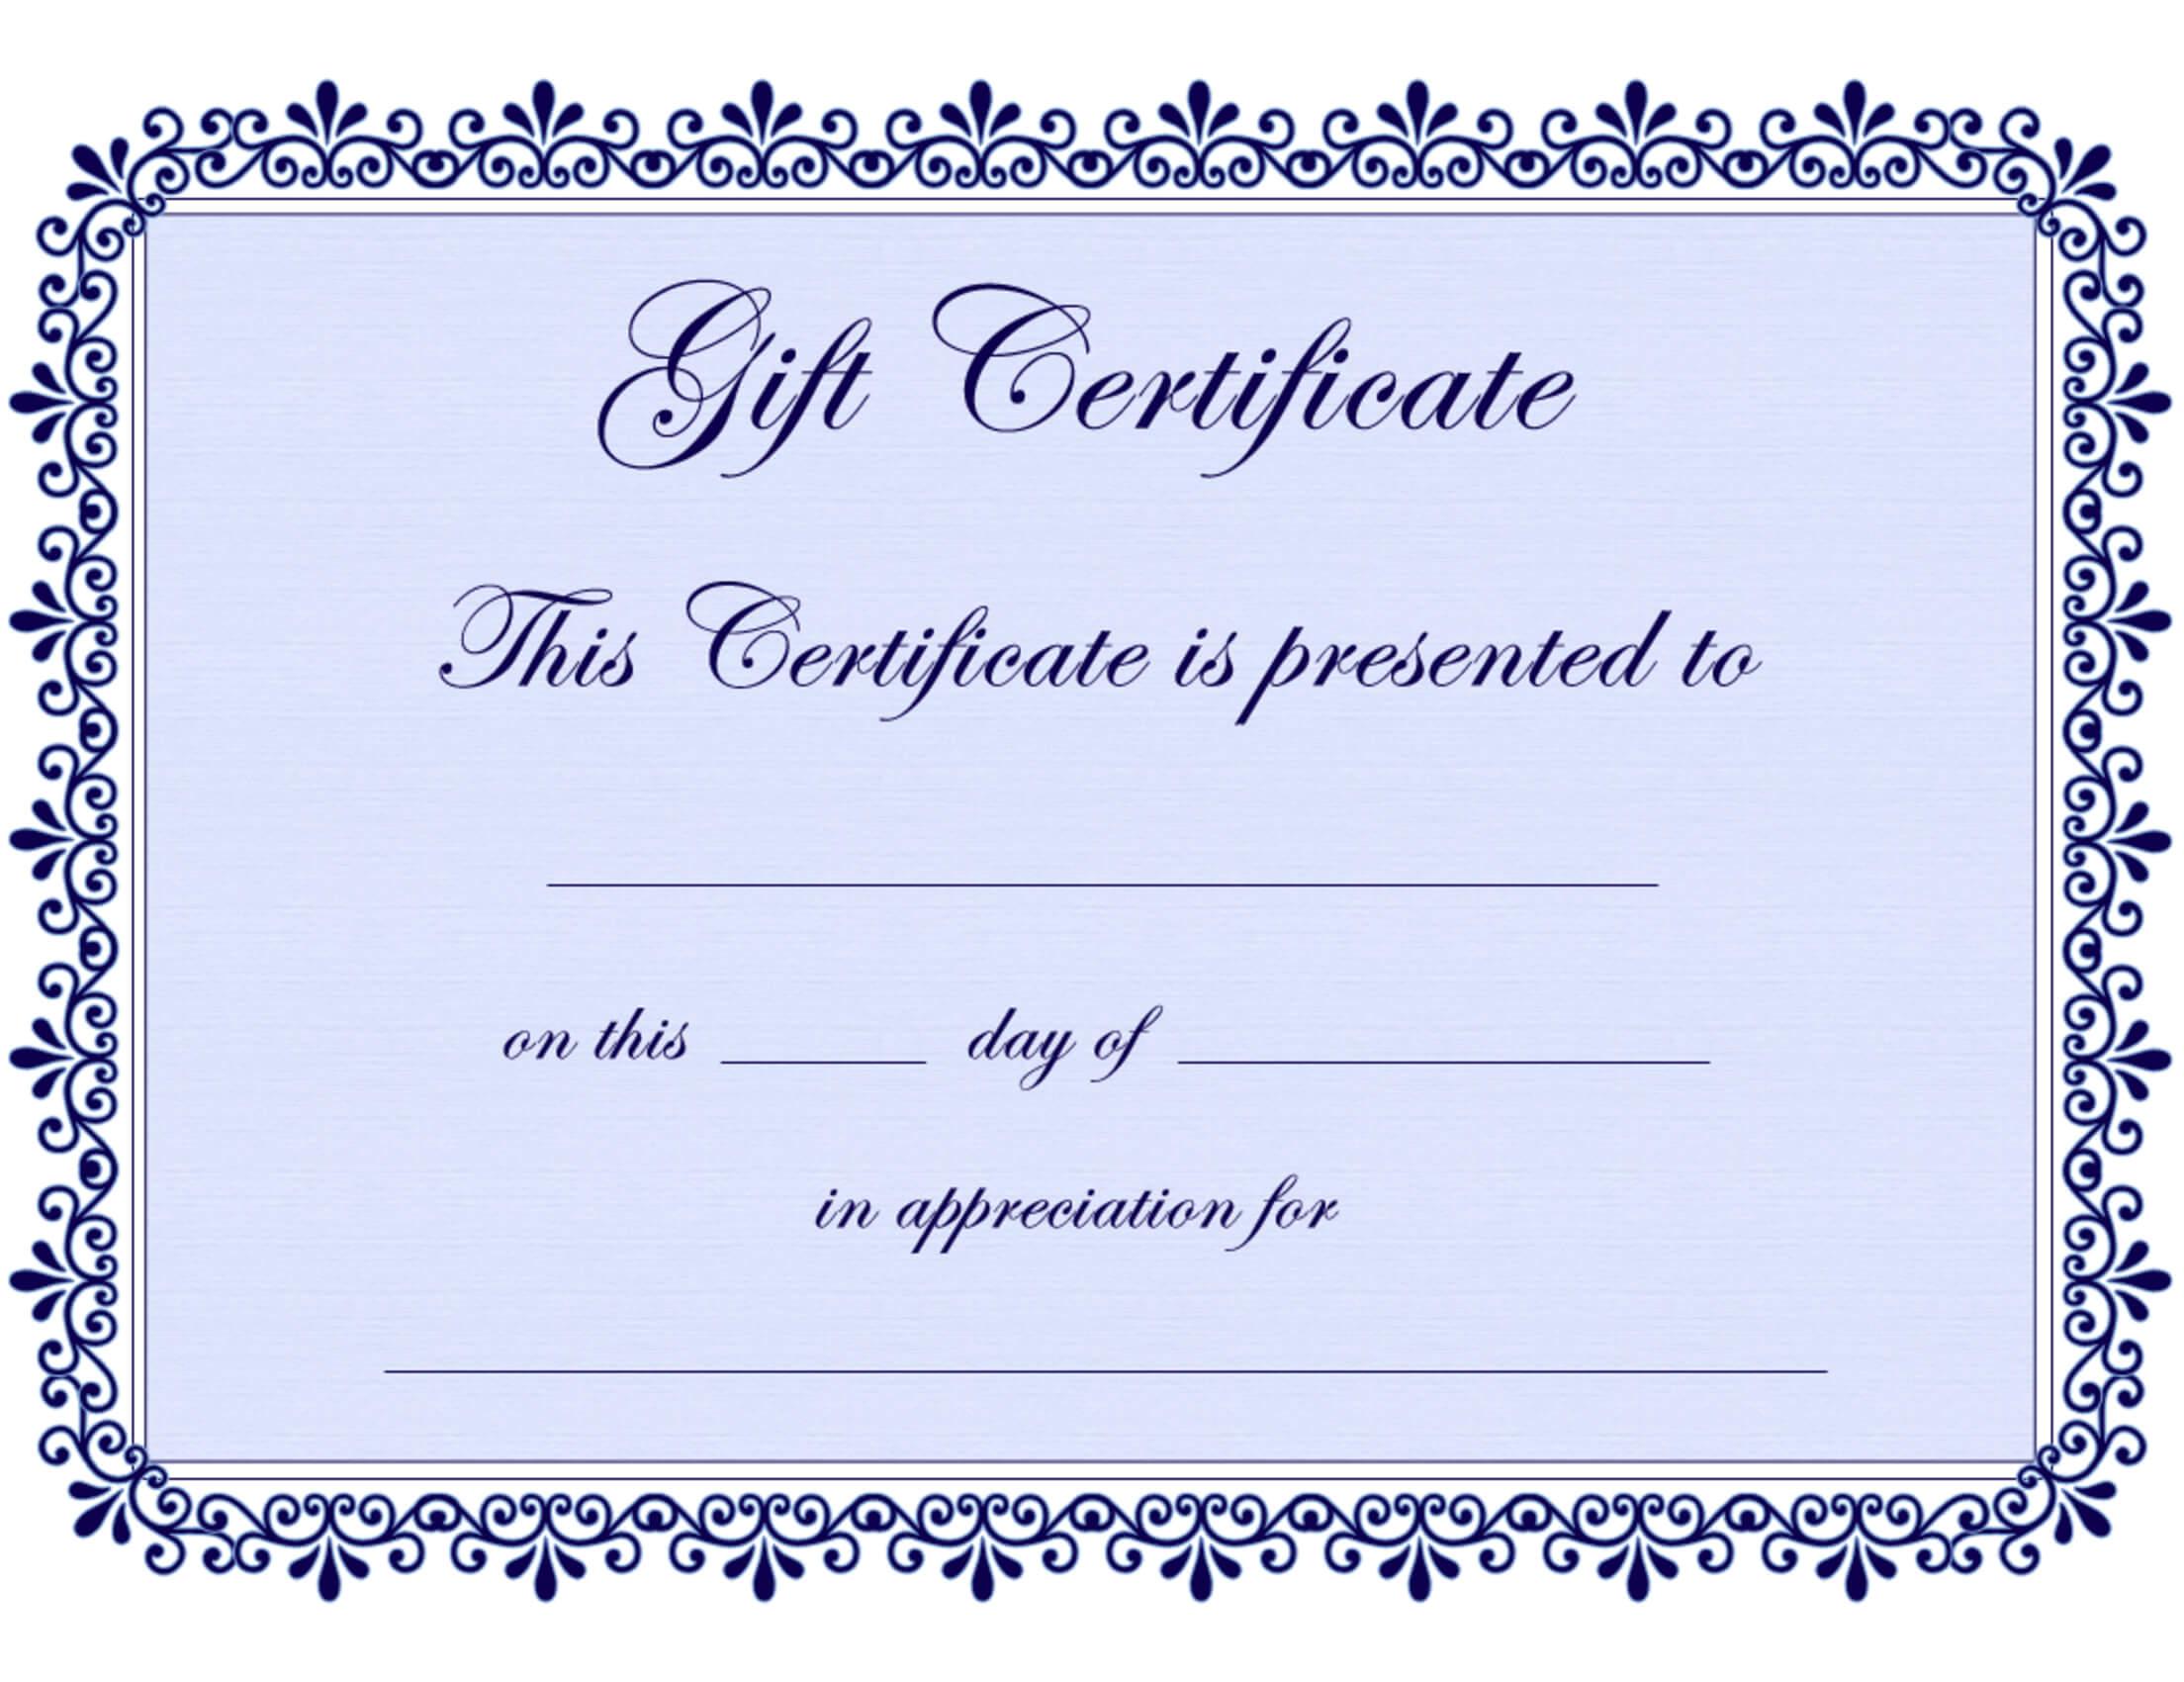 Certificate Templates   Gift Certificate Template Free – Pdf Within Generic Certificate Template